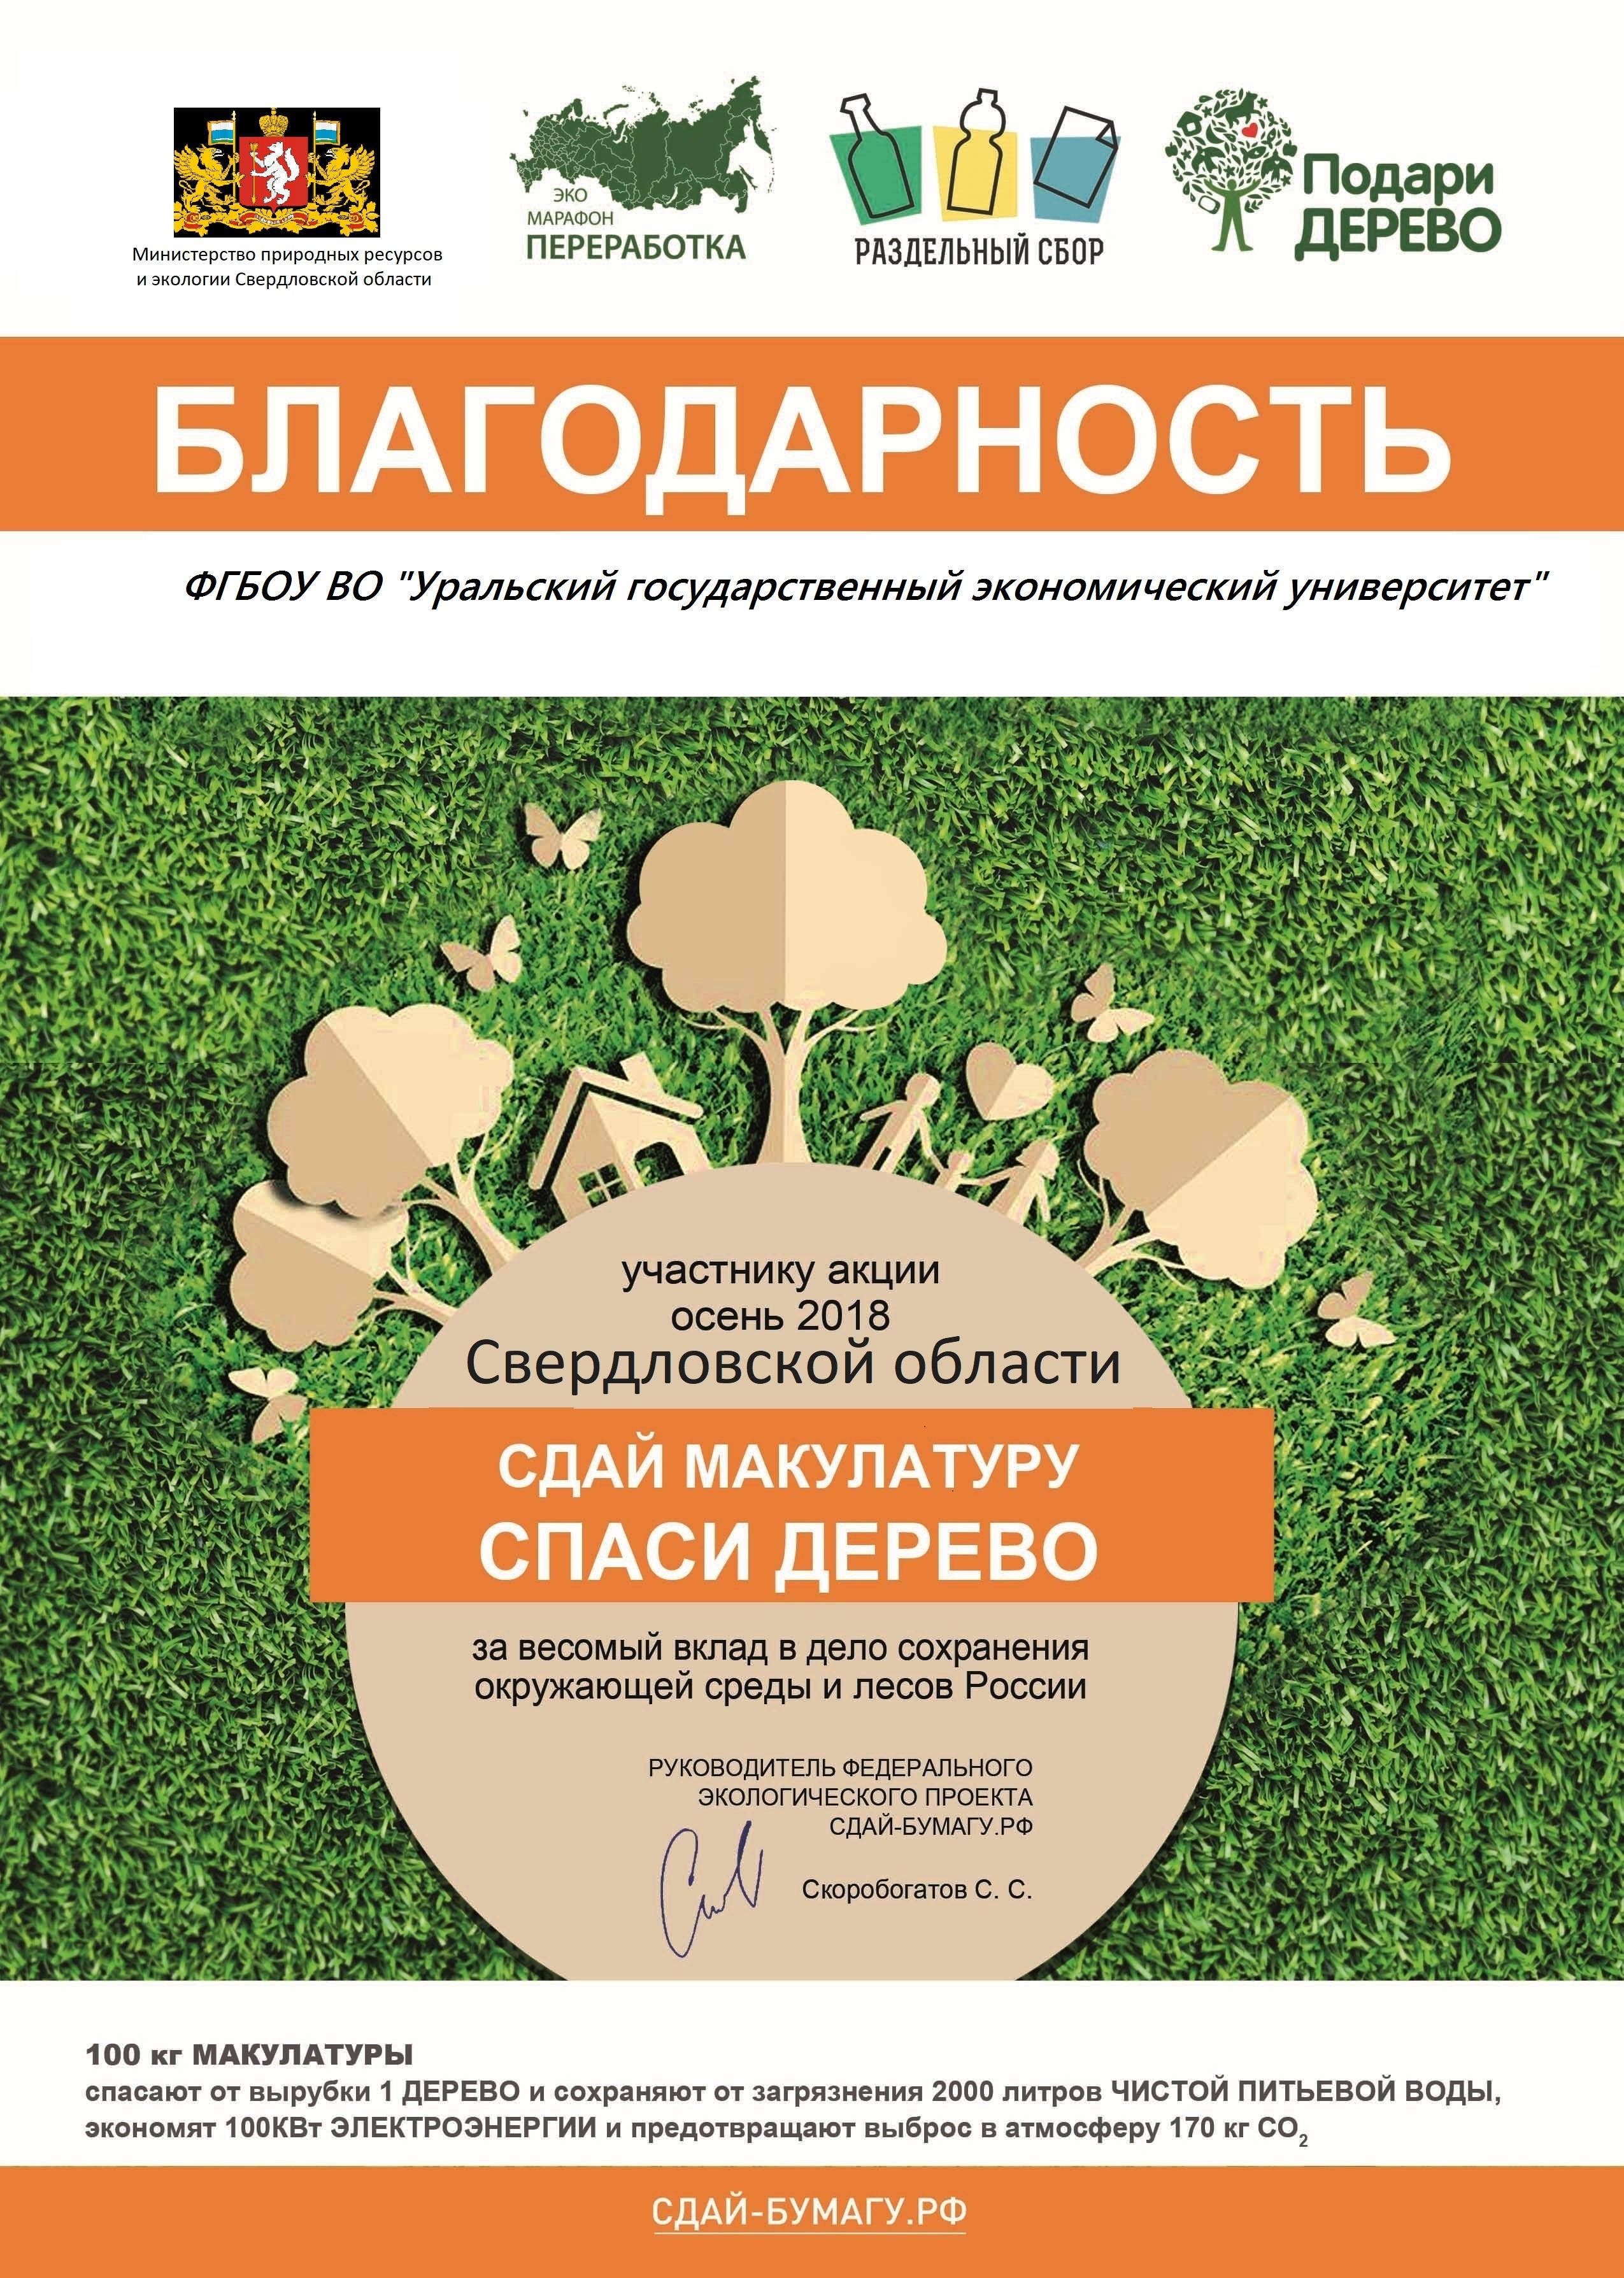 Какие ресурсы сохраняет сбор макулатуры пункты приема макулатуры в спб кировский район